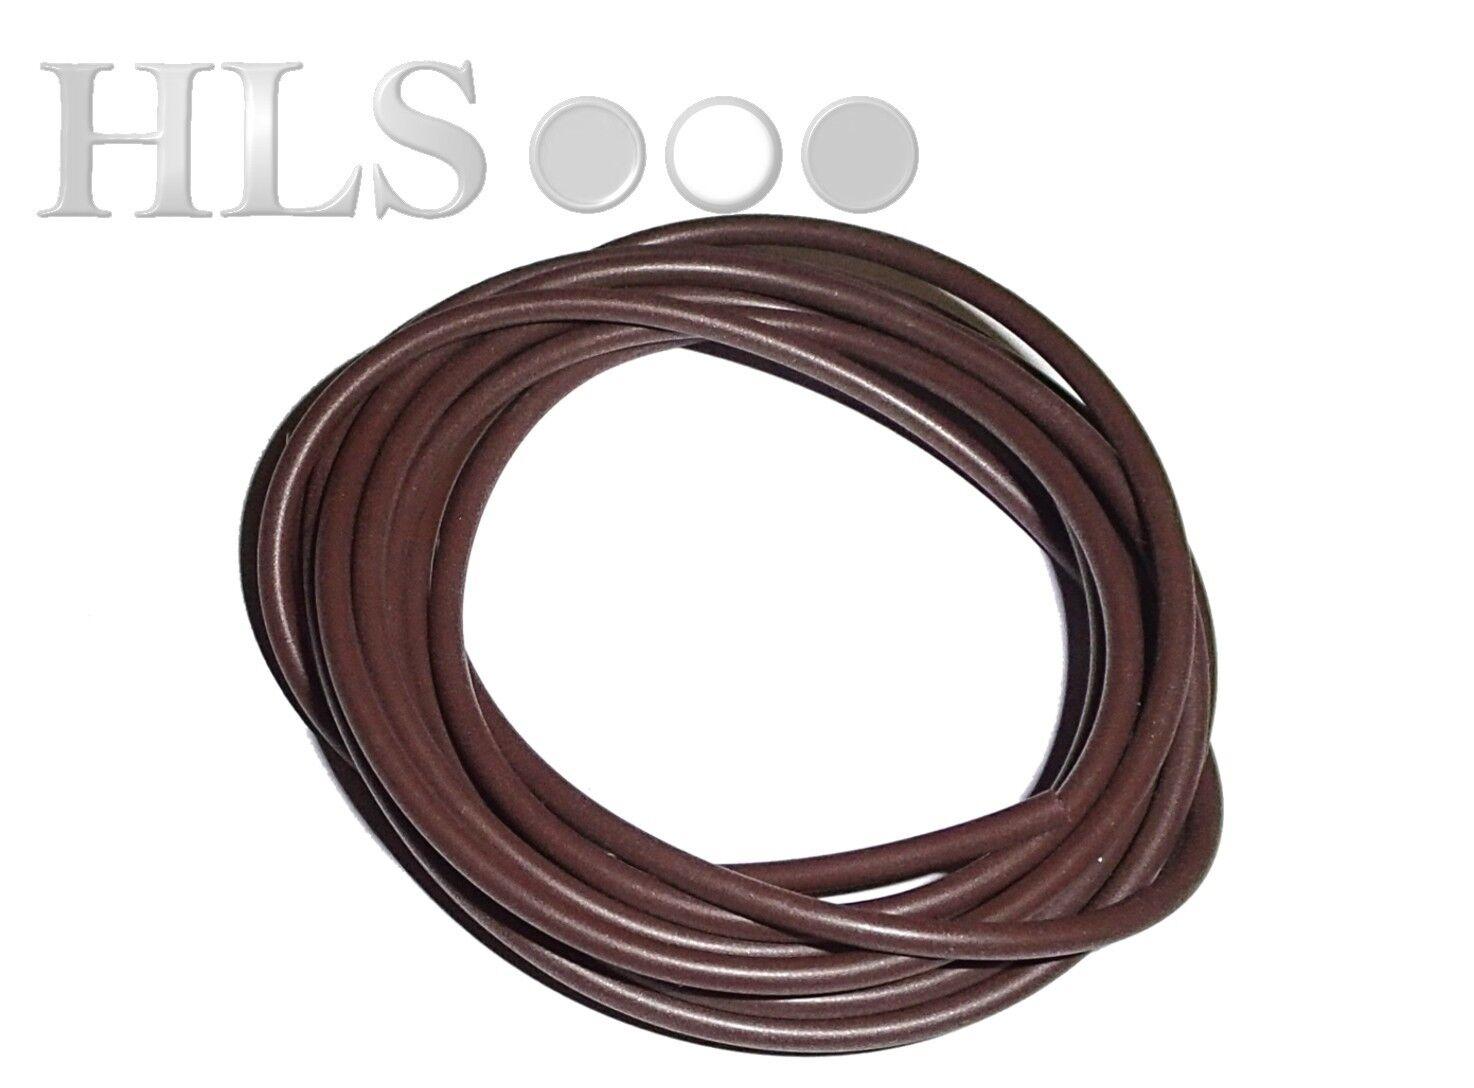 brown Silikon Rig Tube 0.5 - 5.0mm  Id Lebensmittelecht Hohe Temp -  80% off